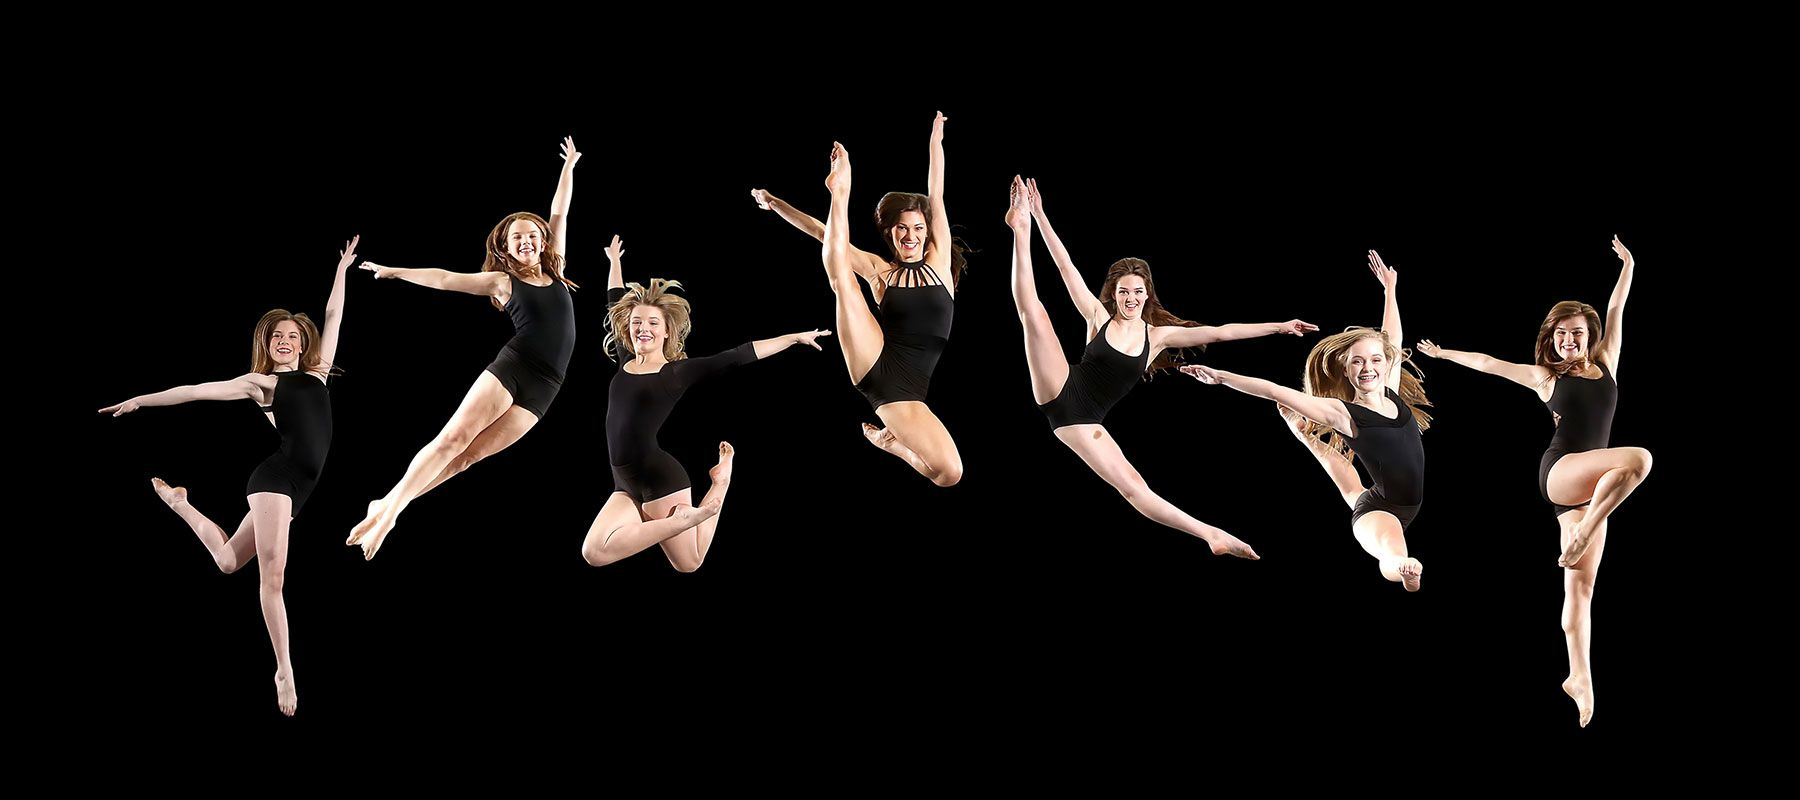 Austin TX Dance Studio